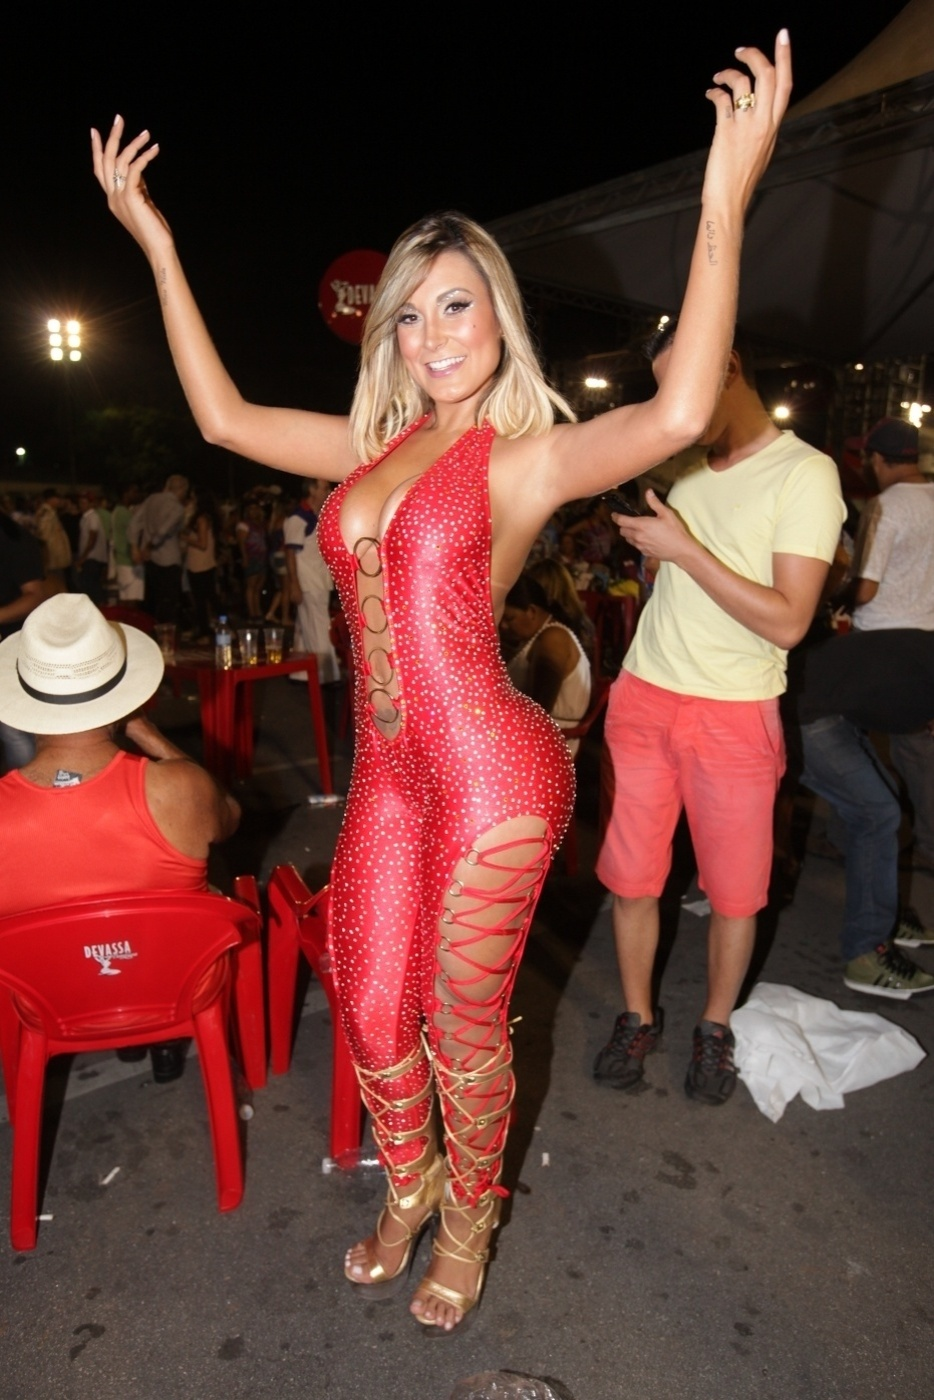 26.jan.14 - Para o Carnaval de 2014, a Leandro de Itaquera prepara o desfile com o enredo